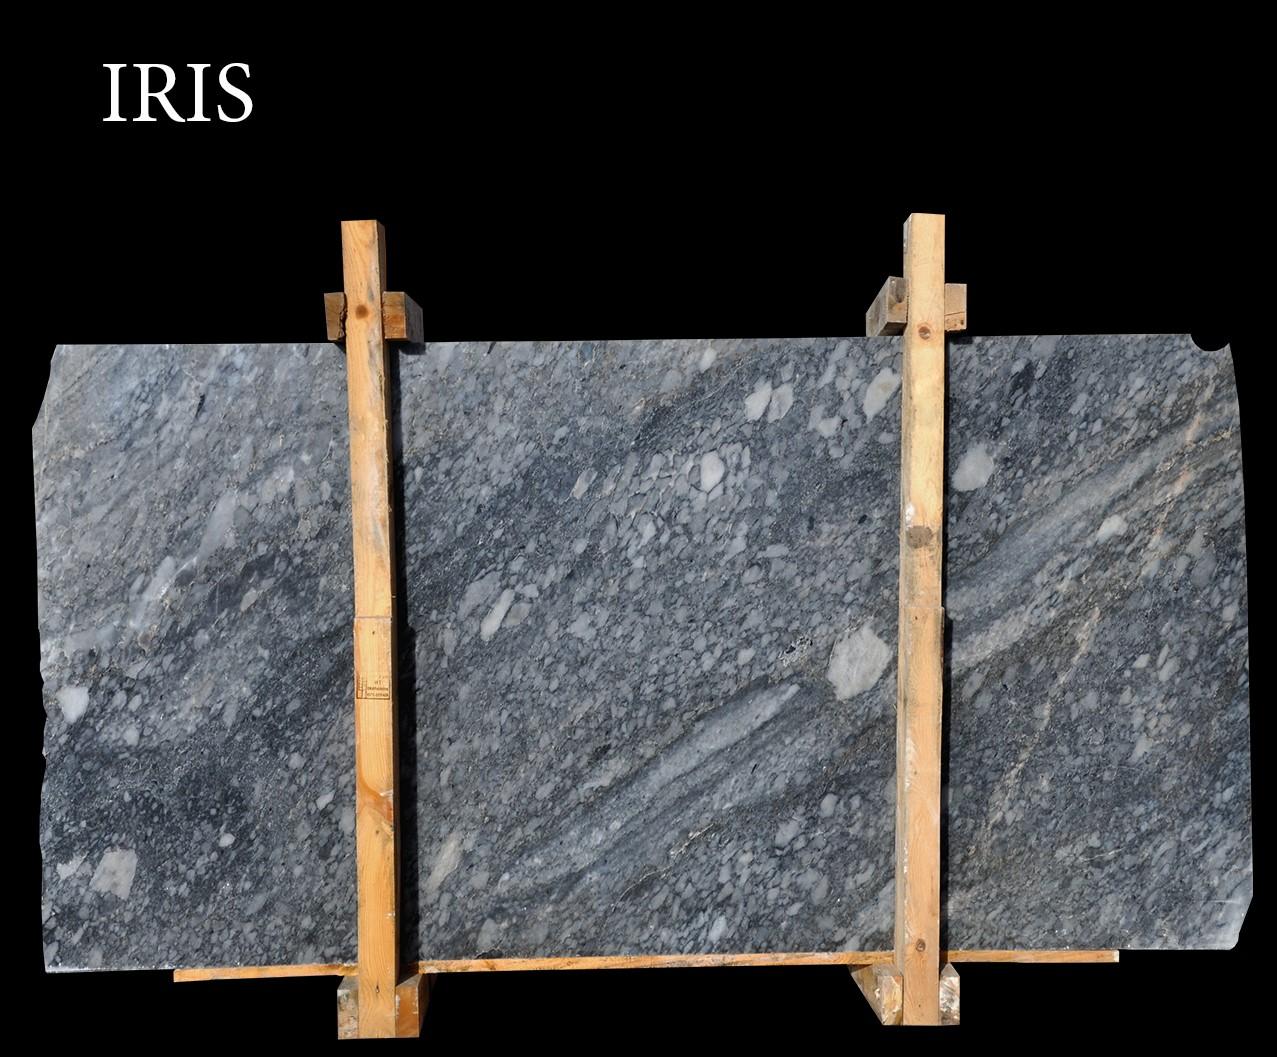 Iris - Afyon Grey Marble Slabs